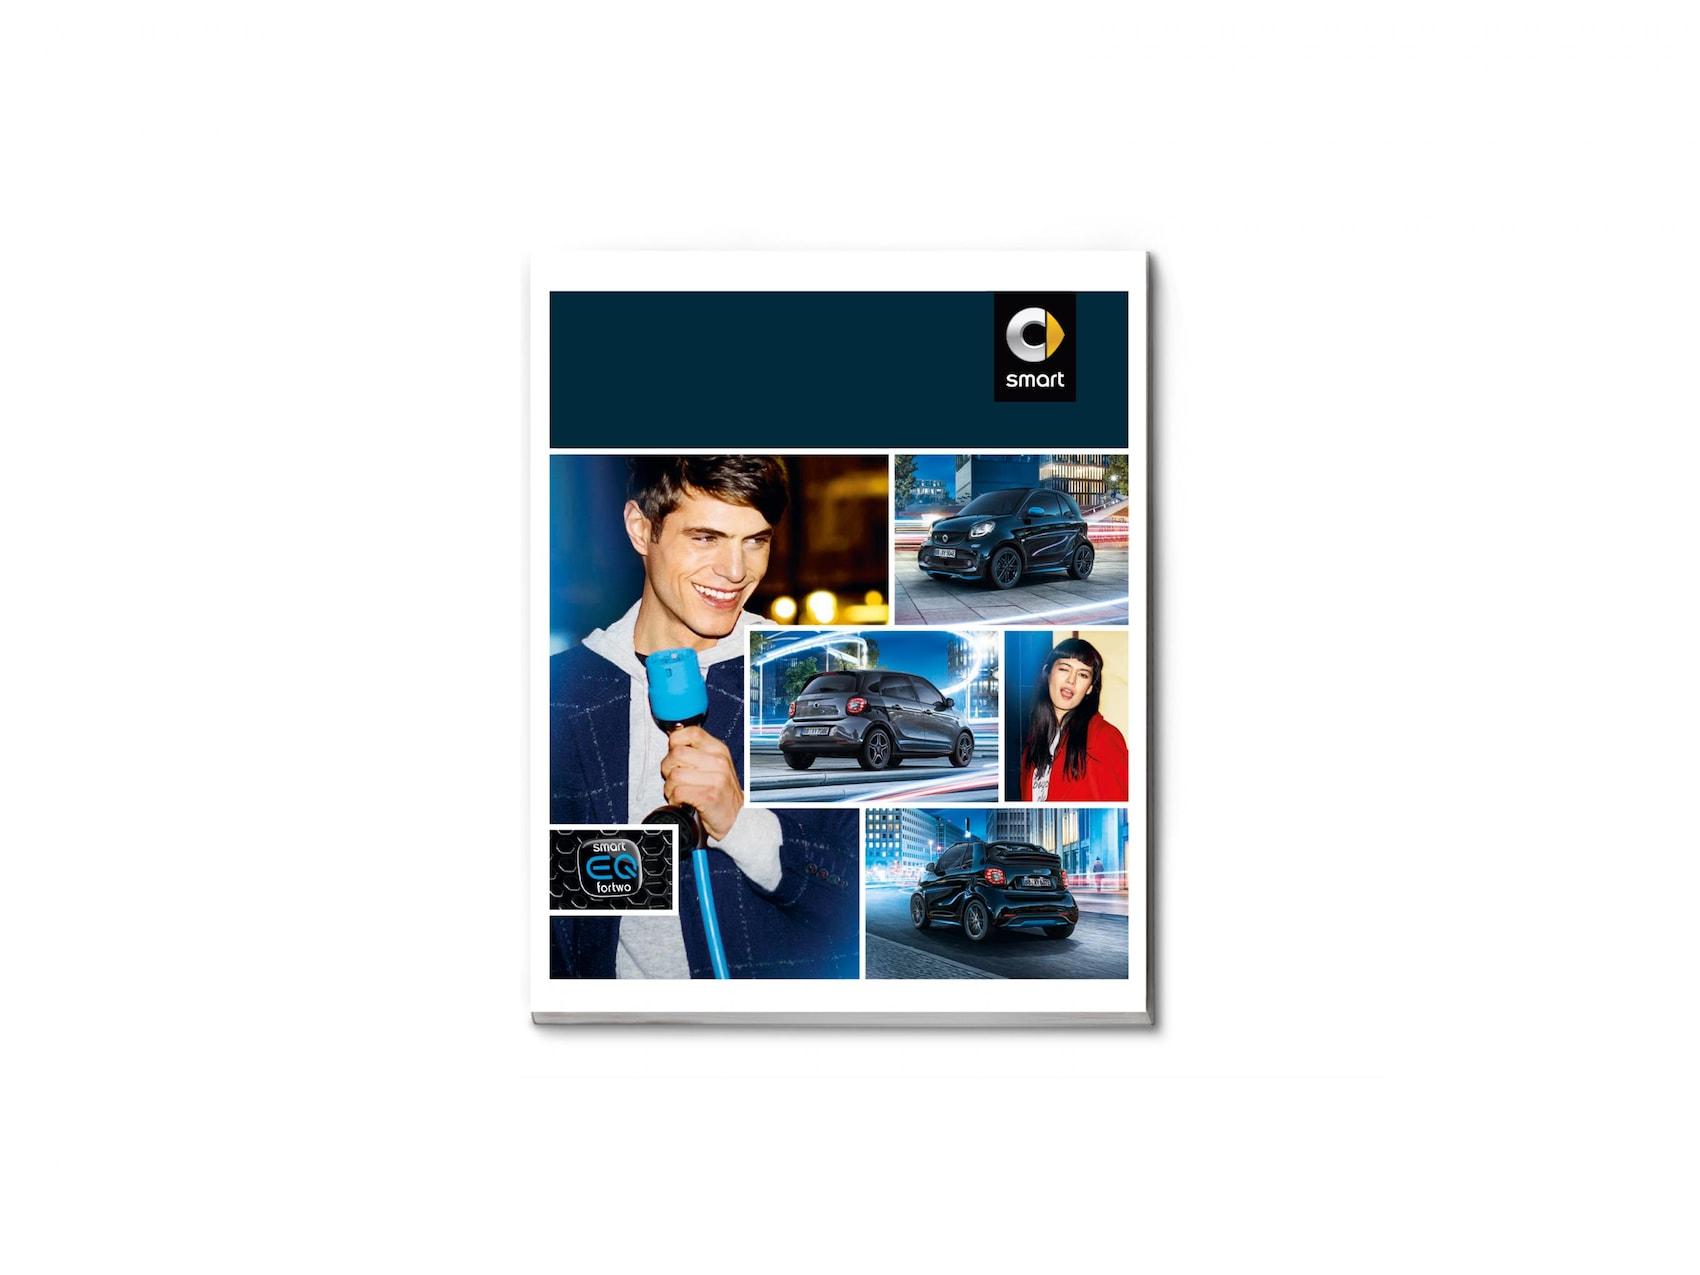 mbch-shop_your_smart-download-center-smart_eq_fortwo_forfour